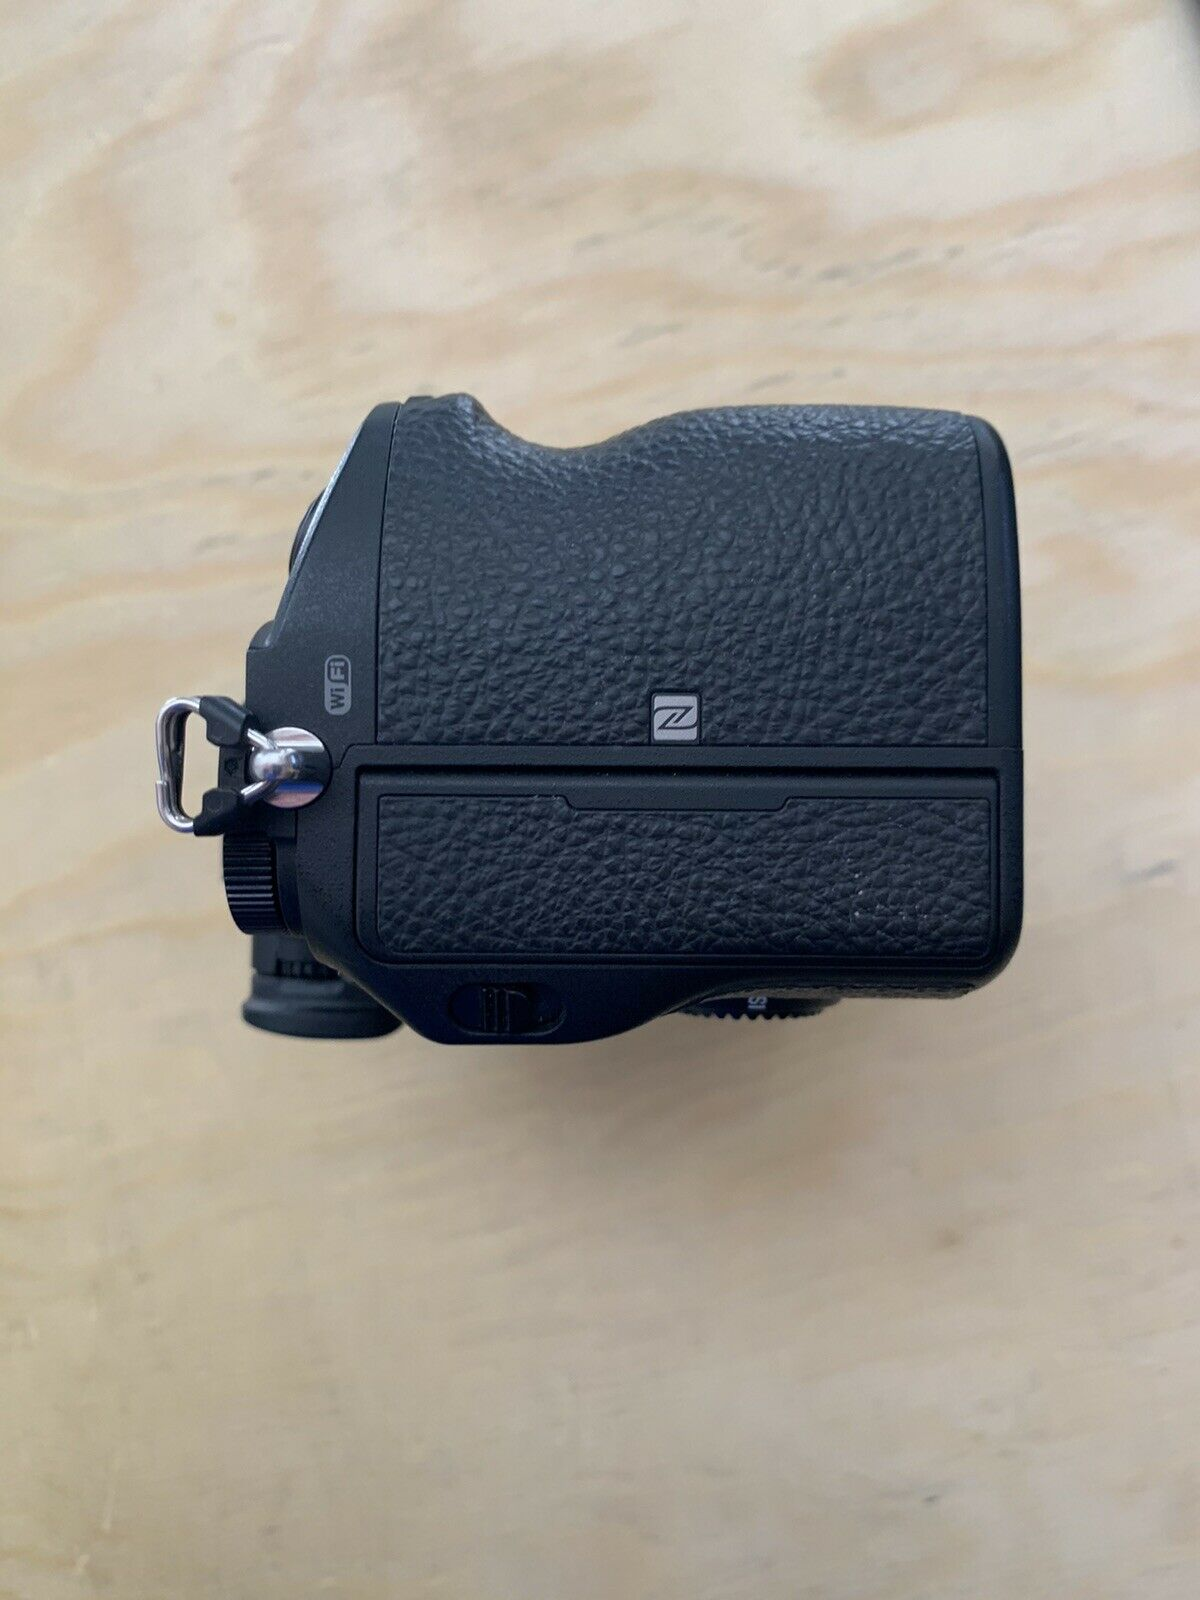 Sony a7 III 24.2 MP Mirrorless Digital Camera (body only)